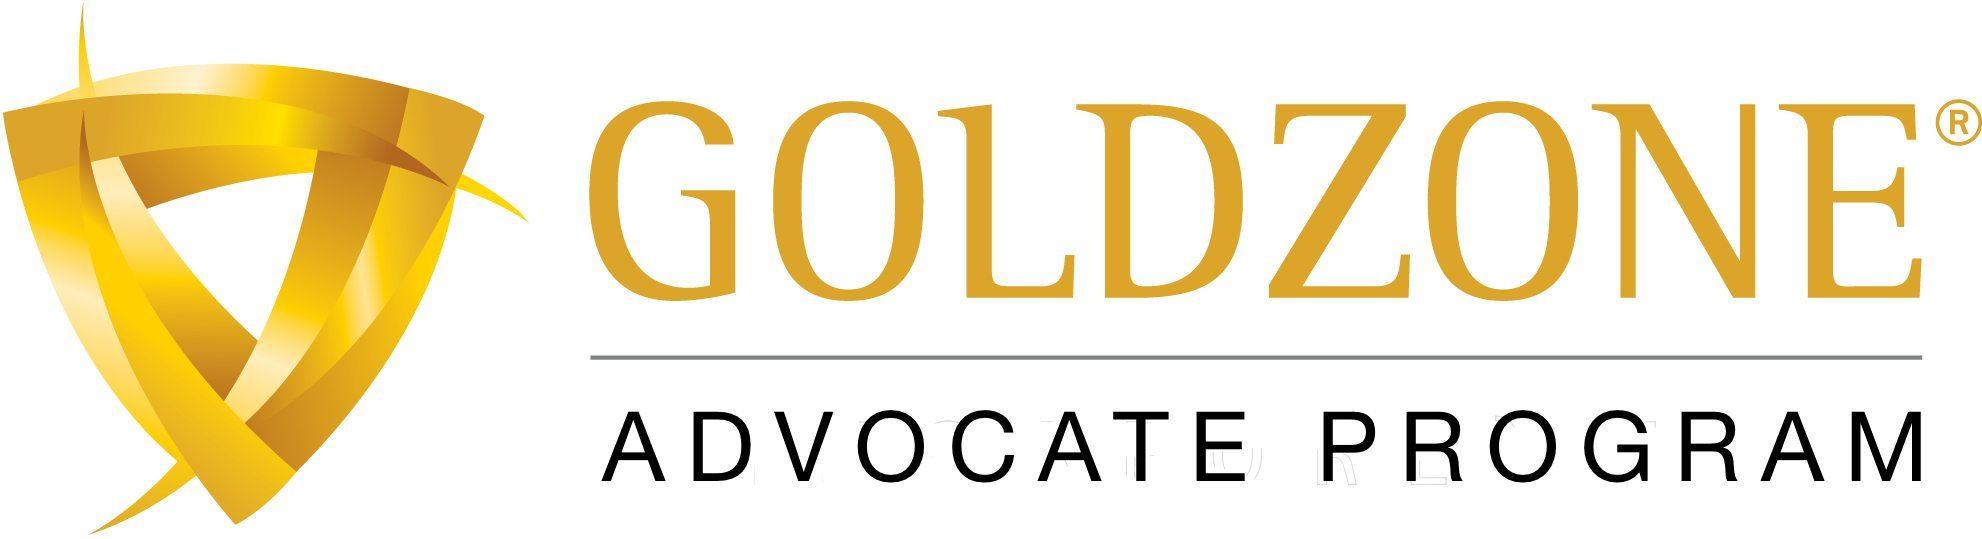 GOLDZONE Advocate